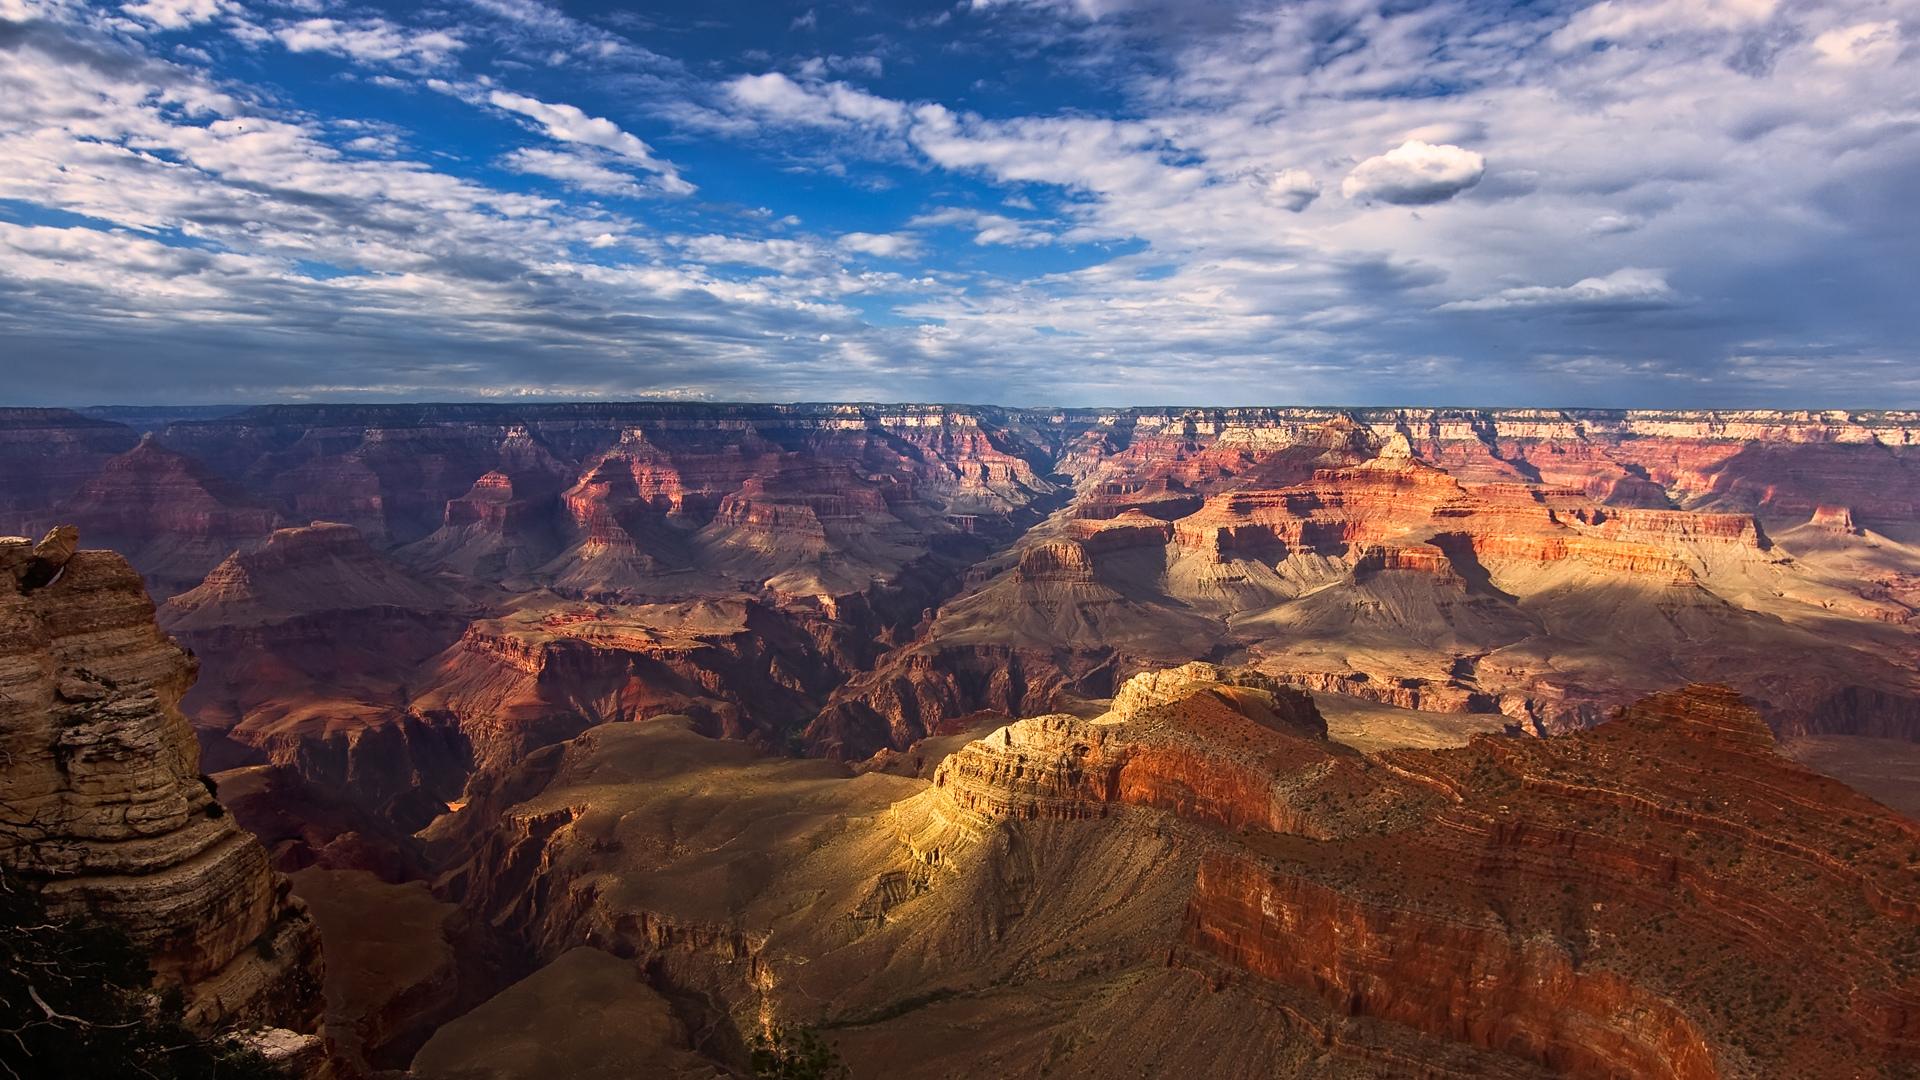 Best 47 Canyon Wallpaper on HipWallpaper Grand Canyon Lightning 1920x1080